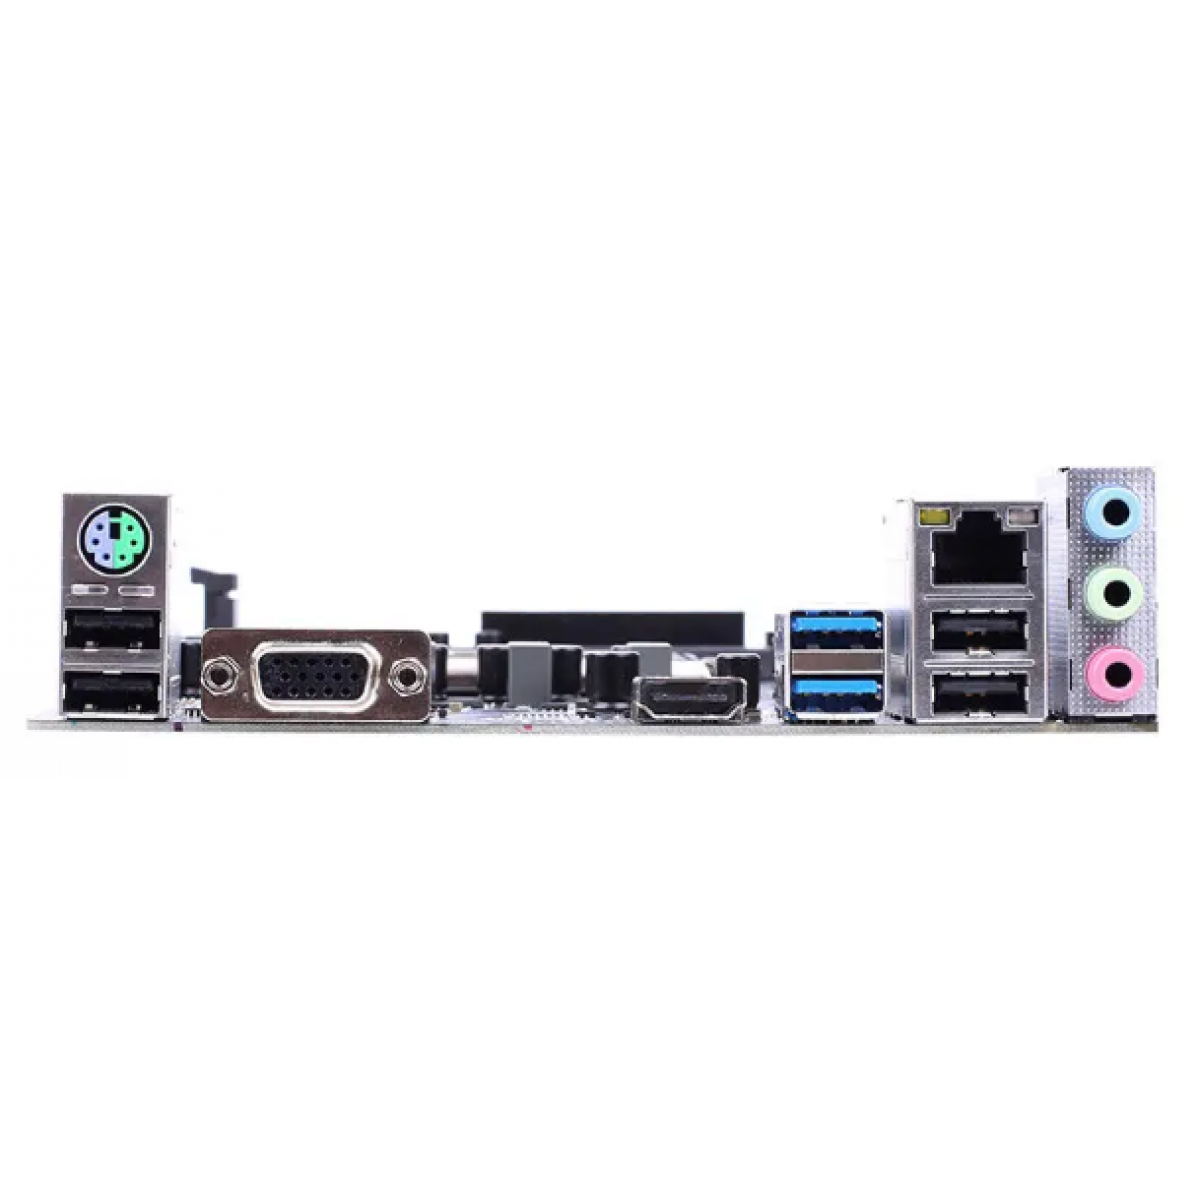 Placa Mãe Colorful H310M-E PRO V20, Chipset H310, Intel LGA 1151, mAXT, DDR4, 110510196602